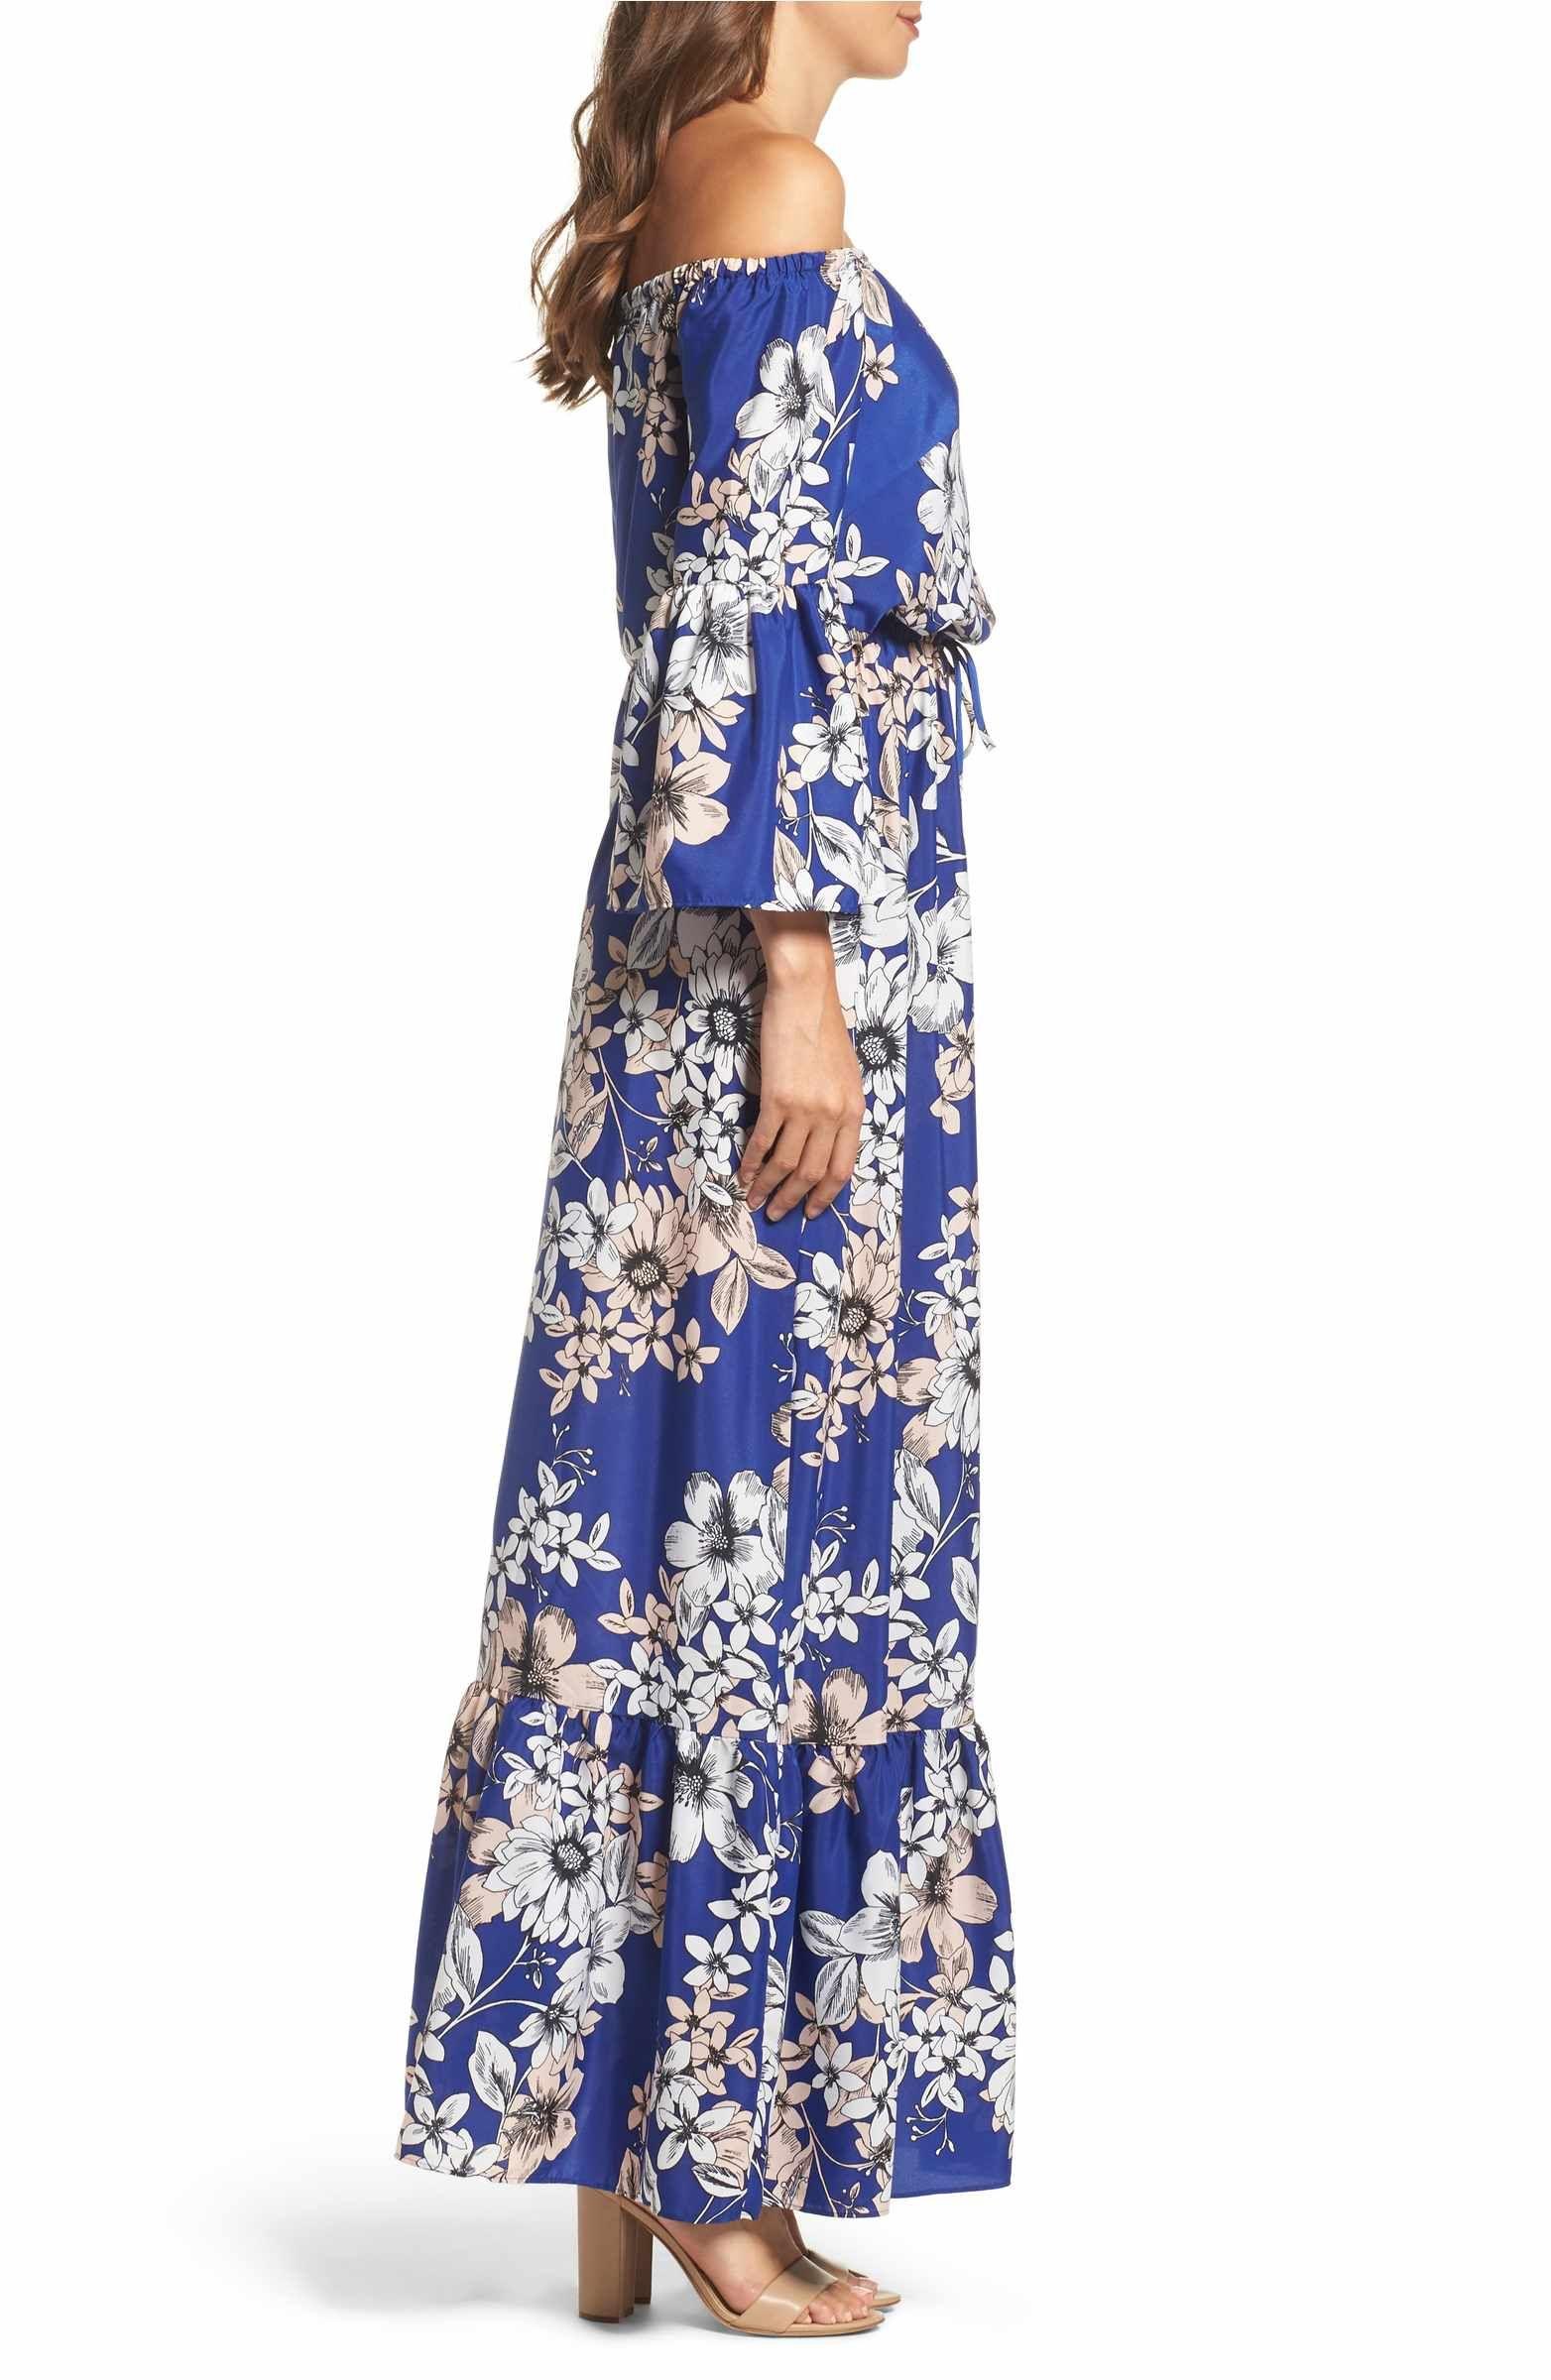 c67167cc09 Main Image - Eliza J Off the Shoulder Floral Maxi Dress (Regular   Petite)